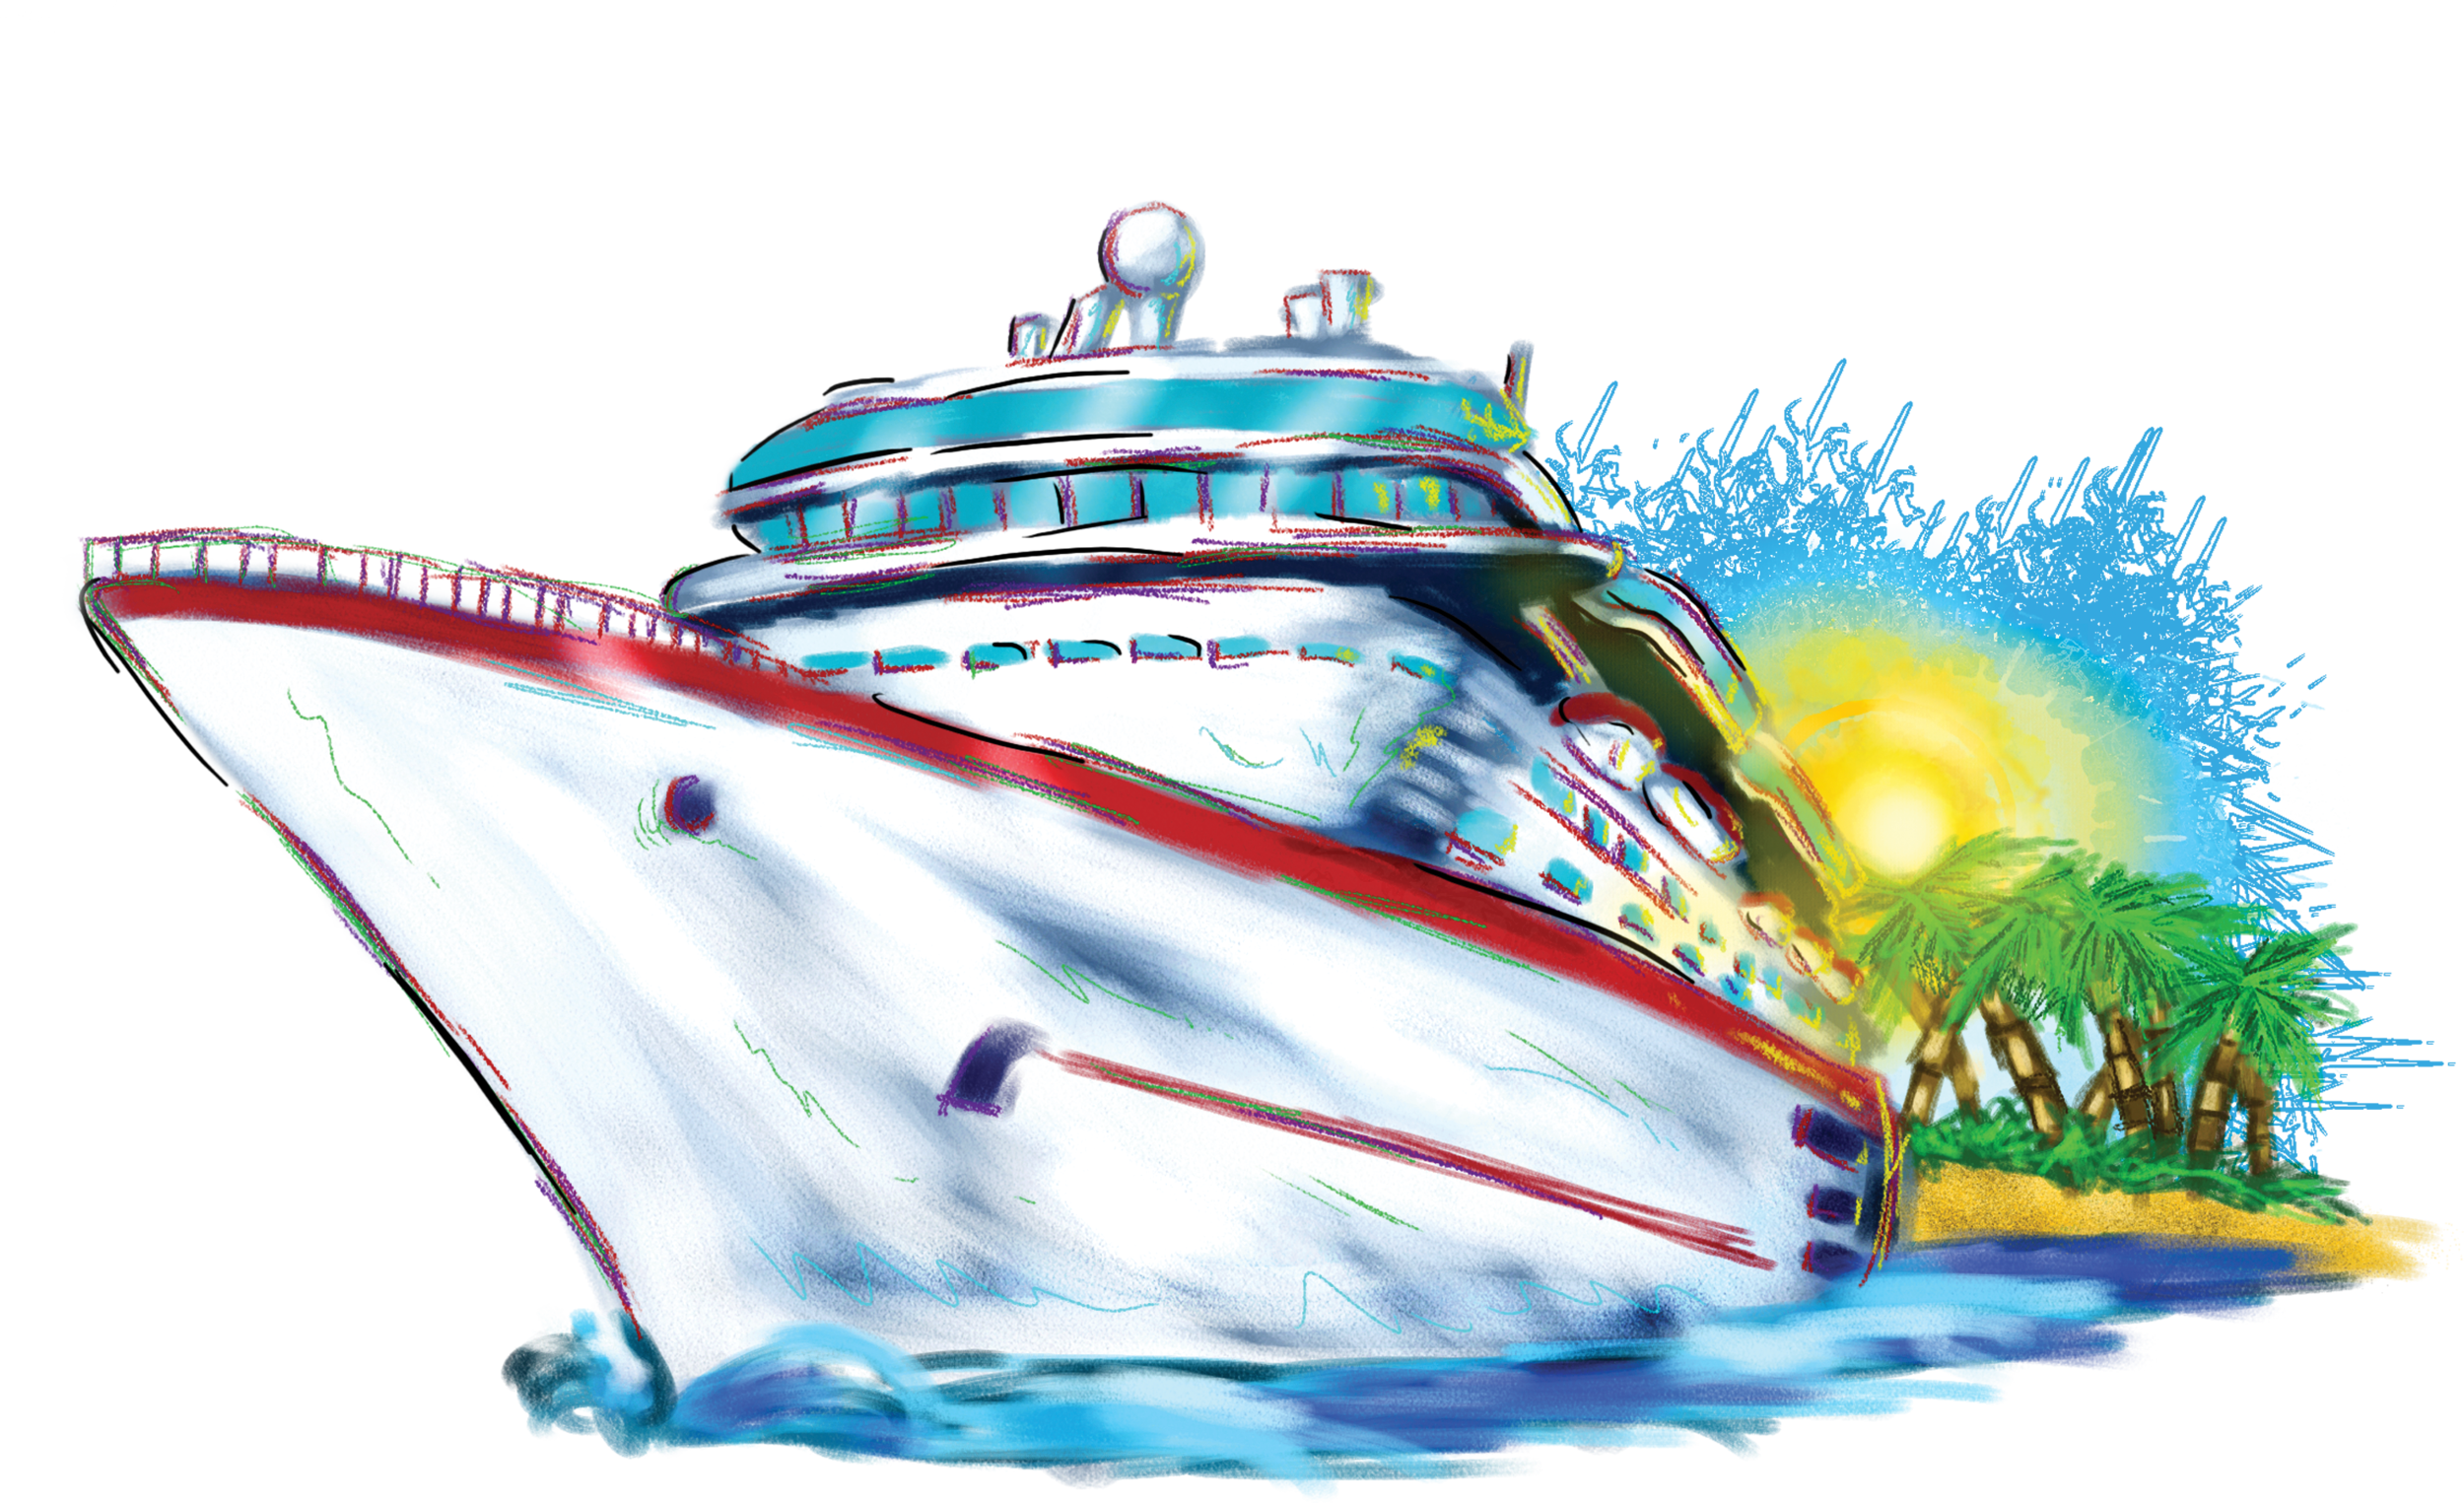 Vacation Cruise Ship The .-Vacation Cruise Ship The .-18